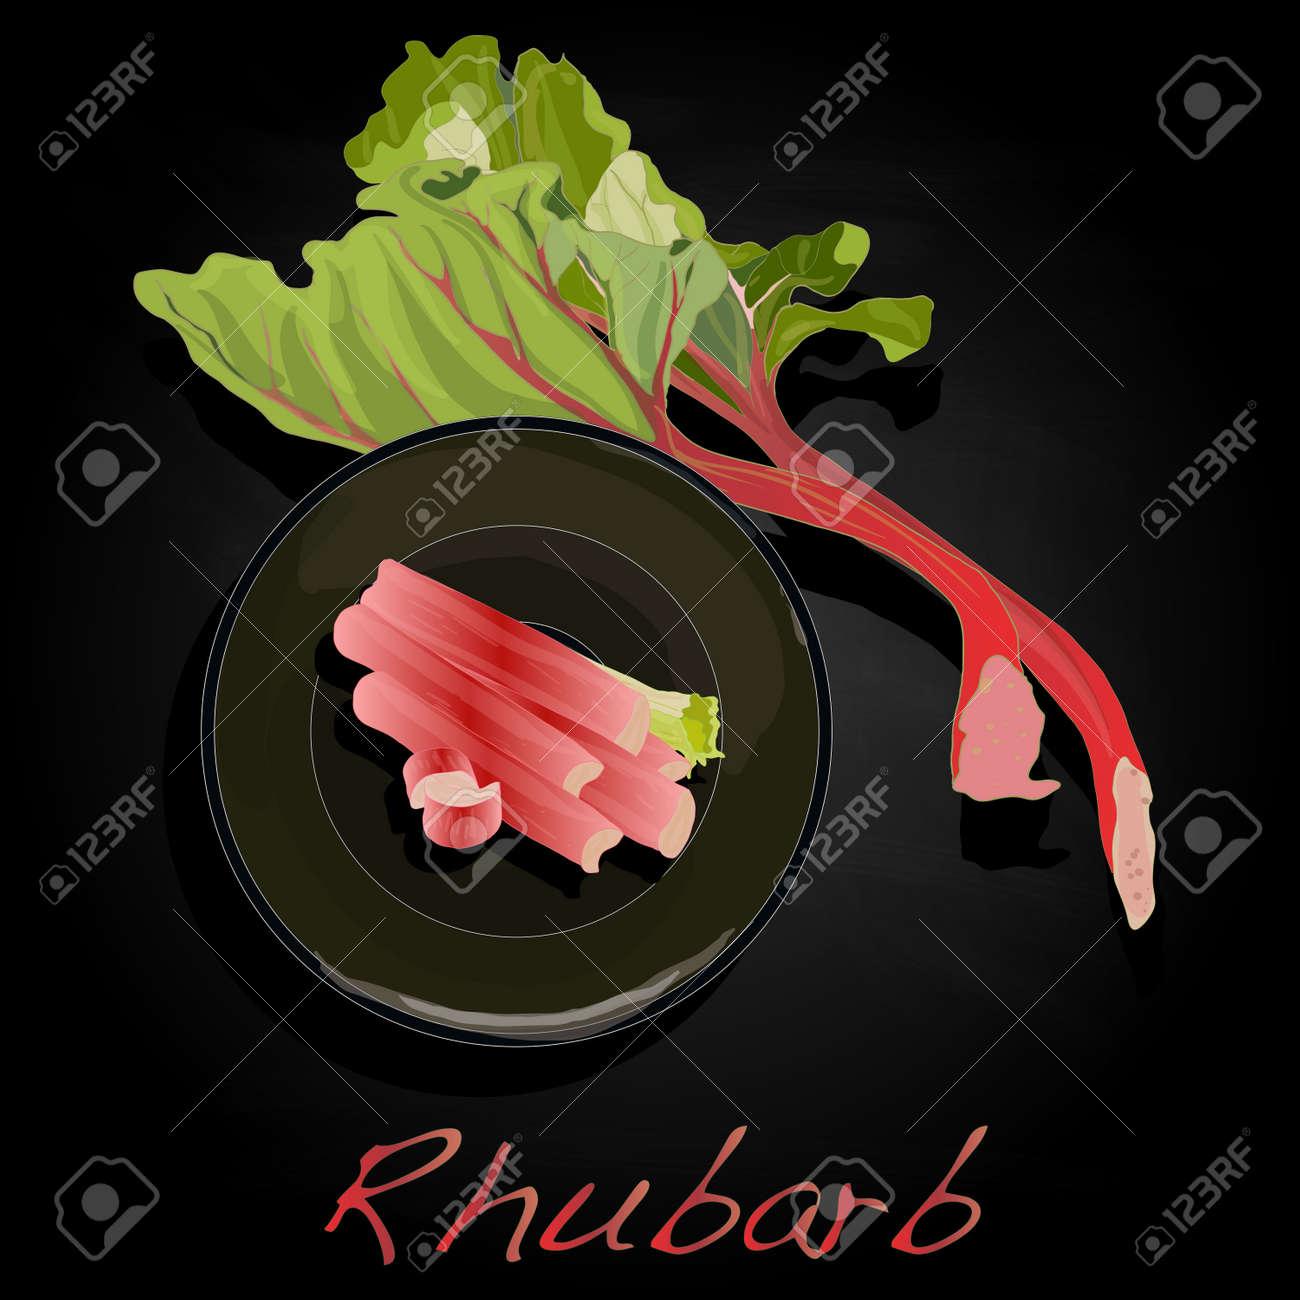 fresh rhubarb isolated on black vector - 81185326